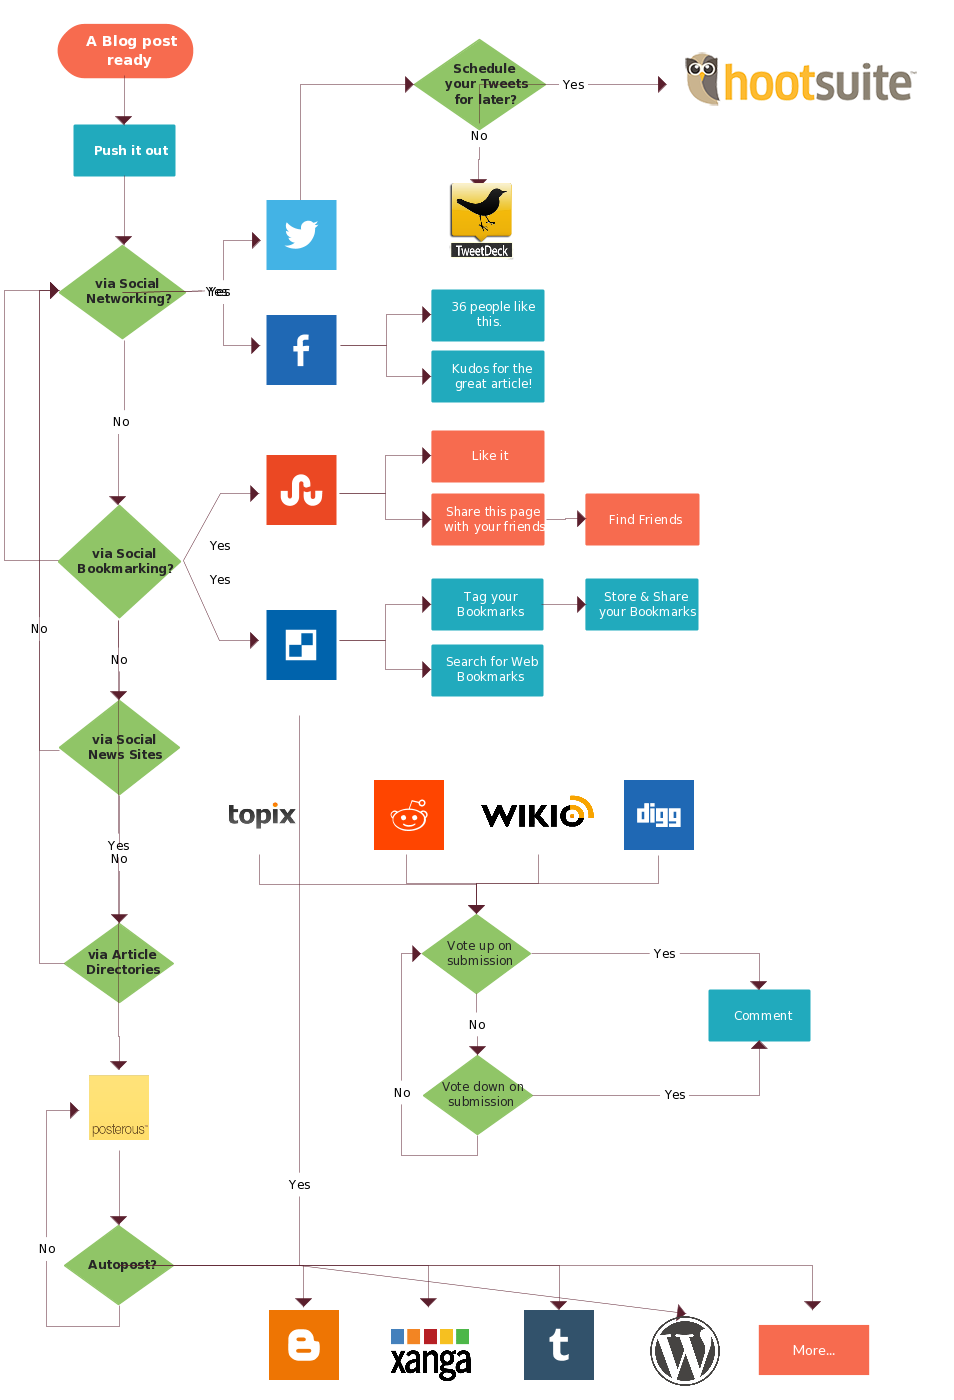 gcg1e07q1 954 1400 business logic marketing automation social marketing process [ 954 x 1400 Pixel ]